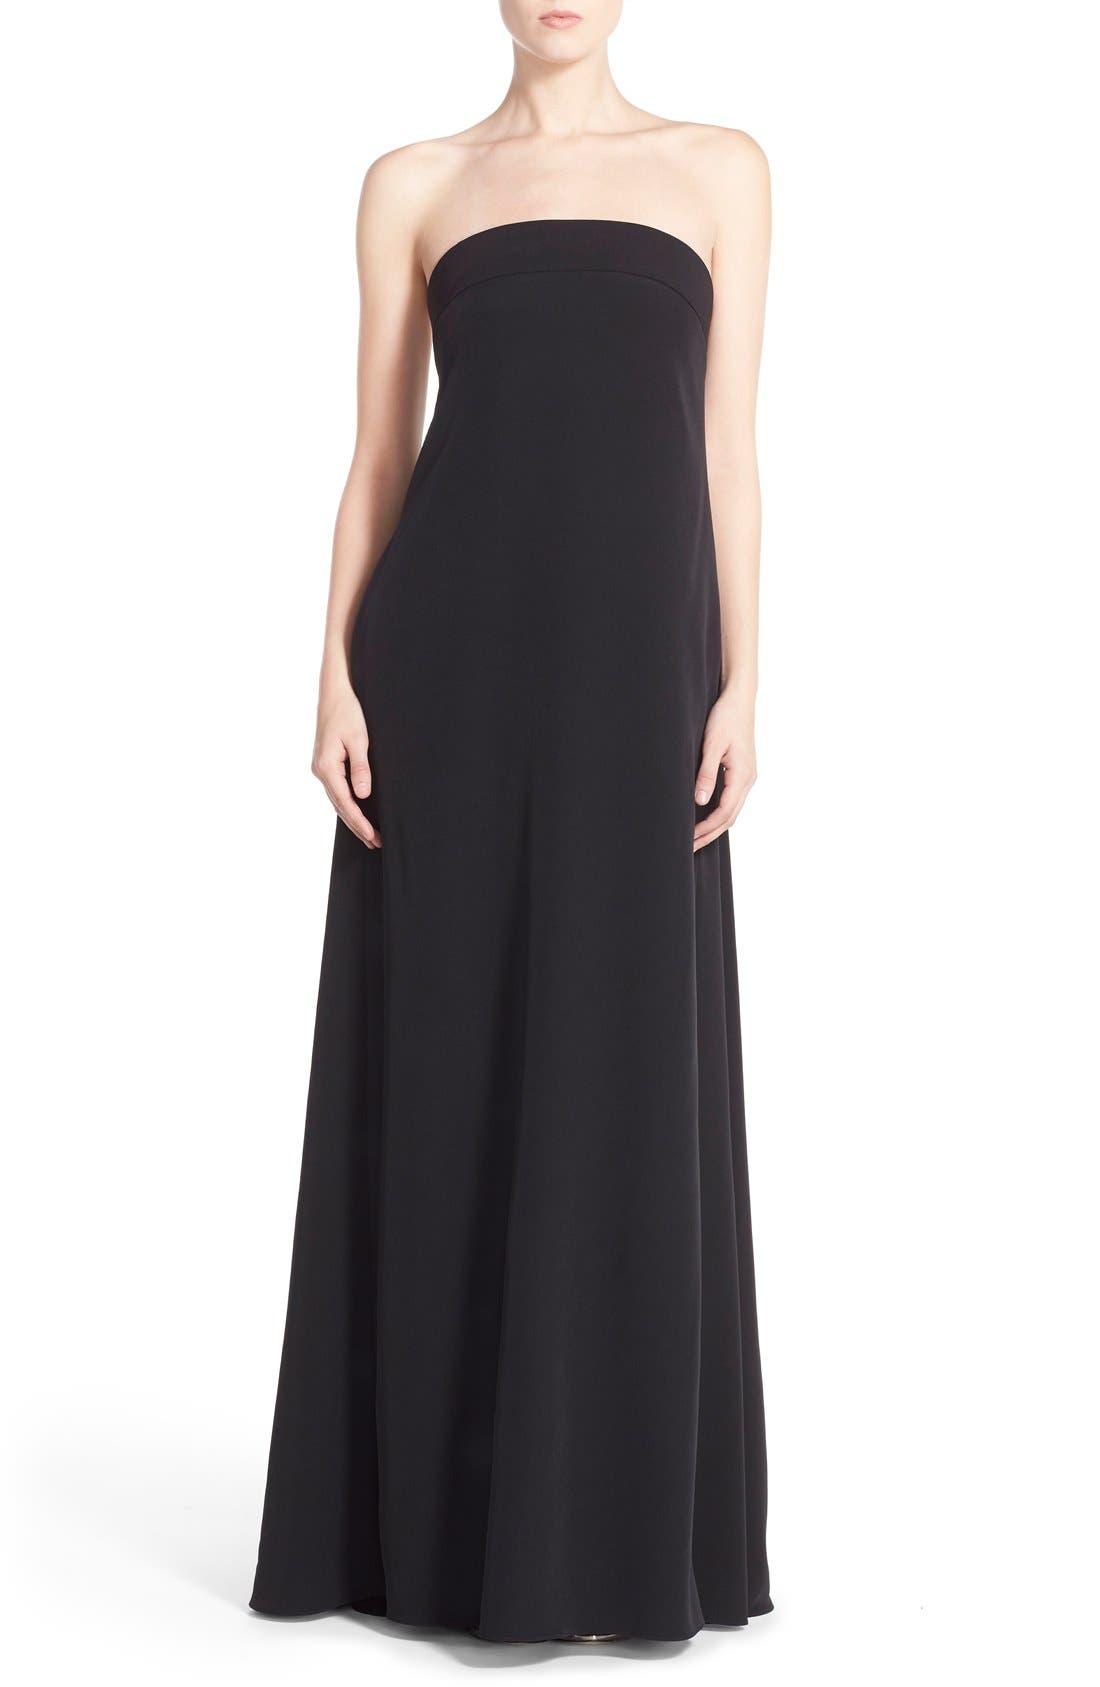 'Vanessa' Strapless Maxi Dress, Main, color, 001